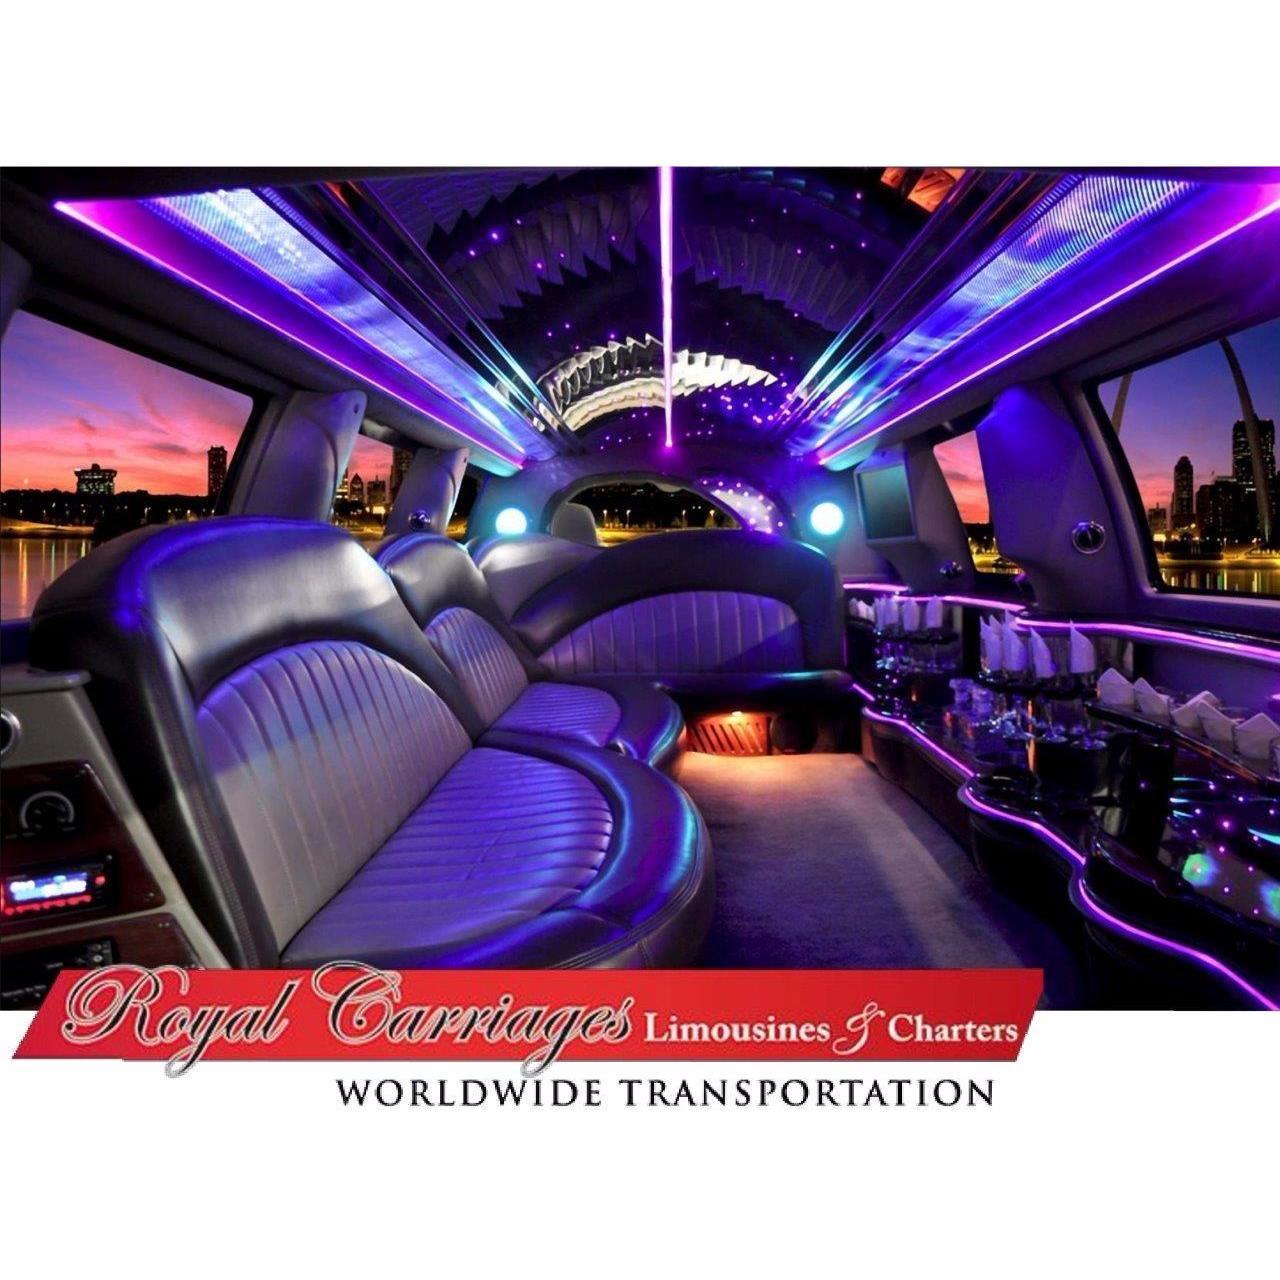 Royal Carriages Limousine